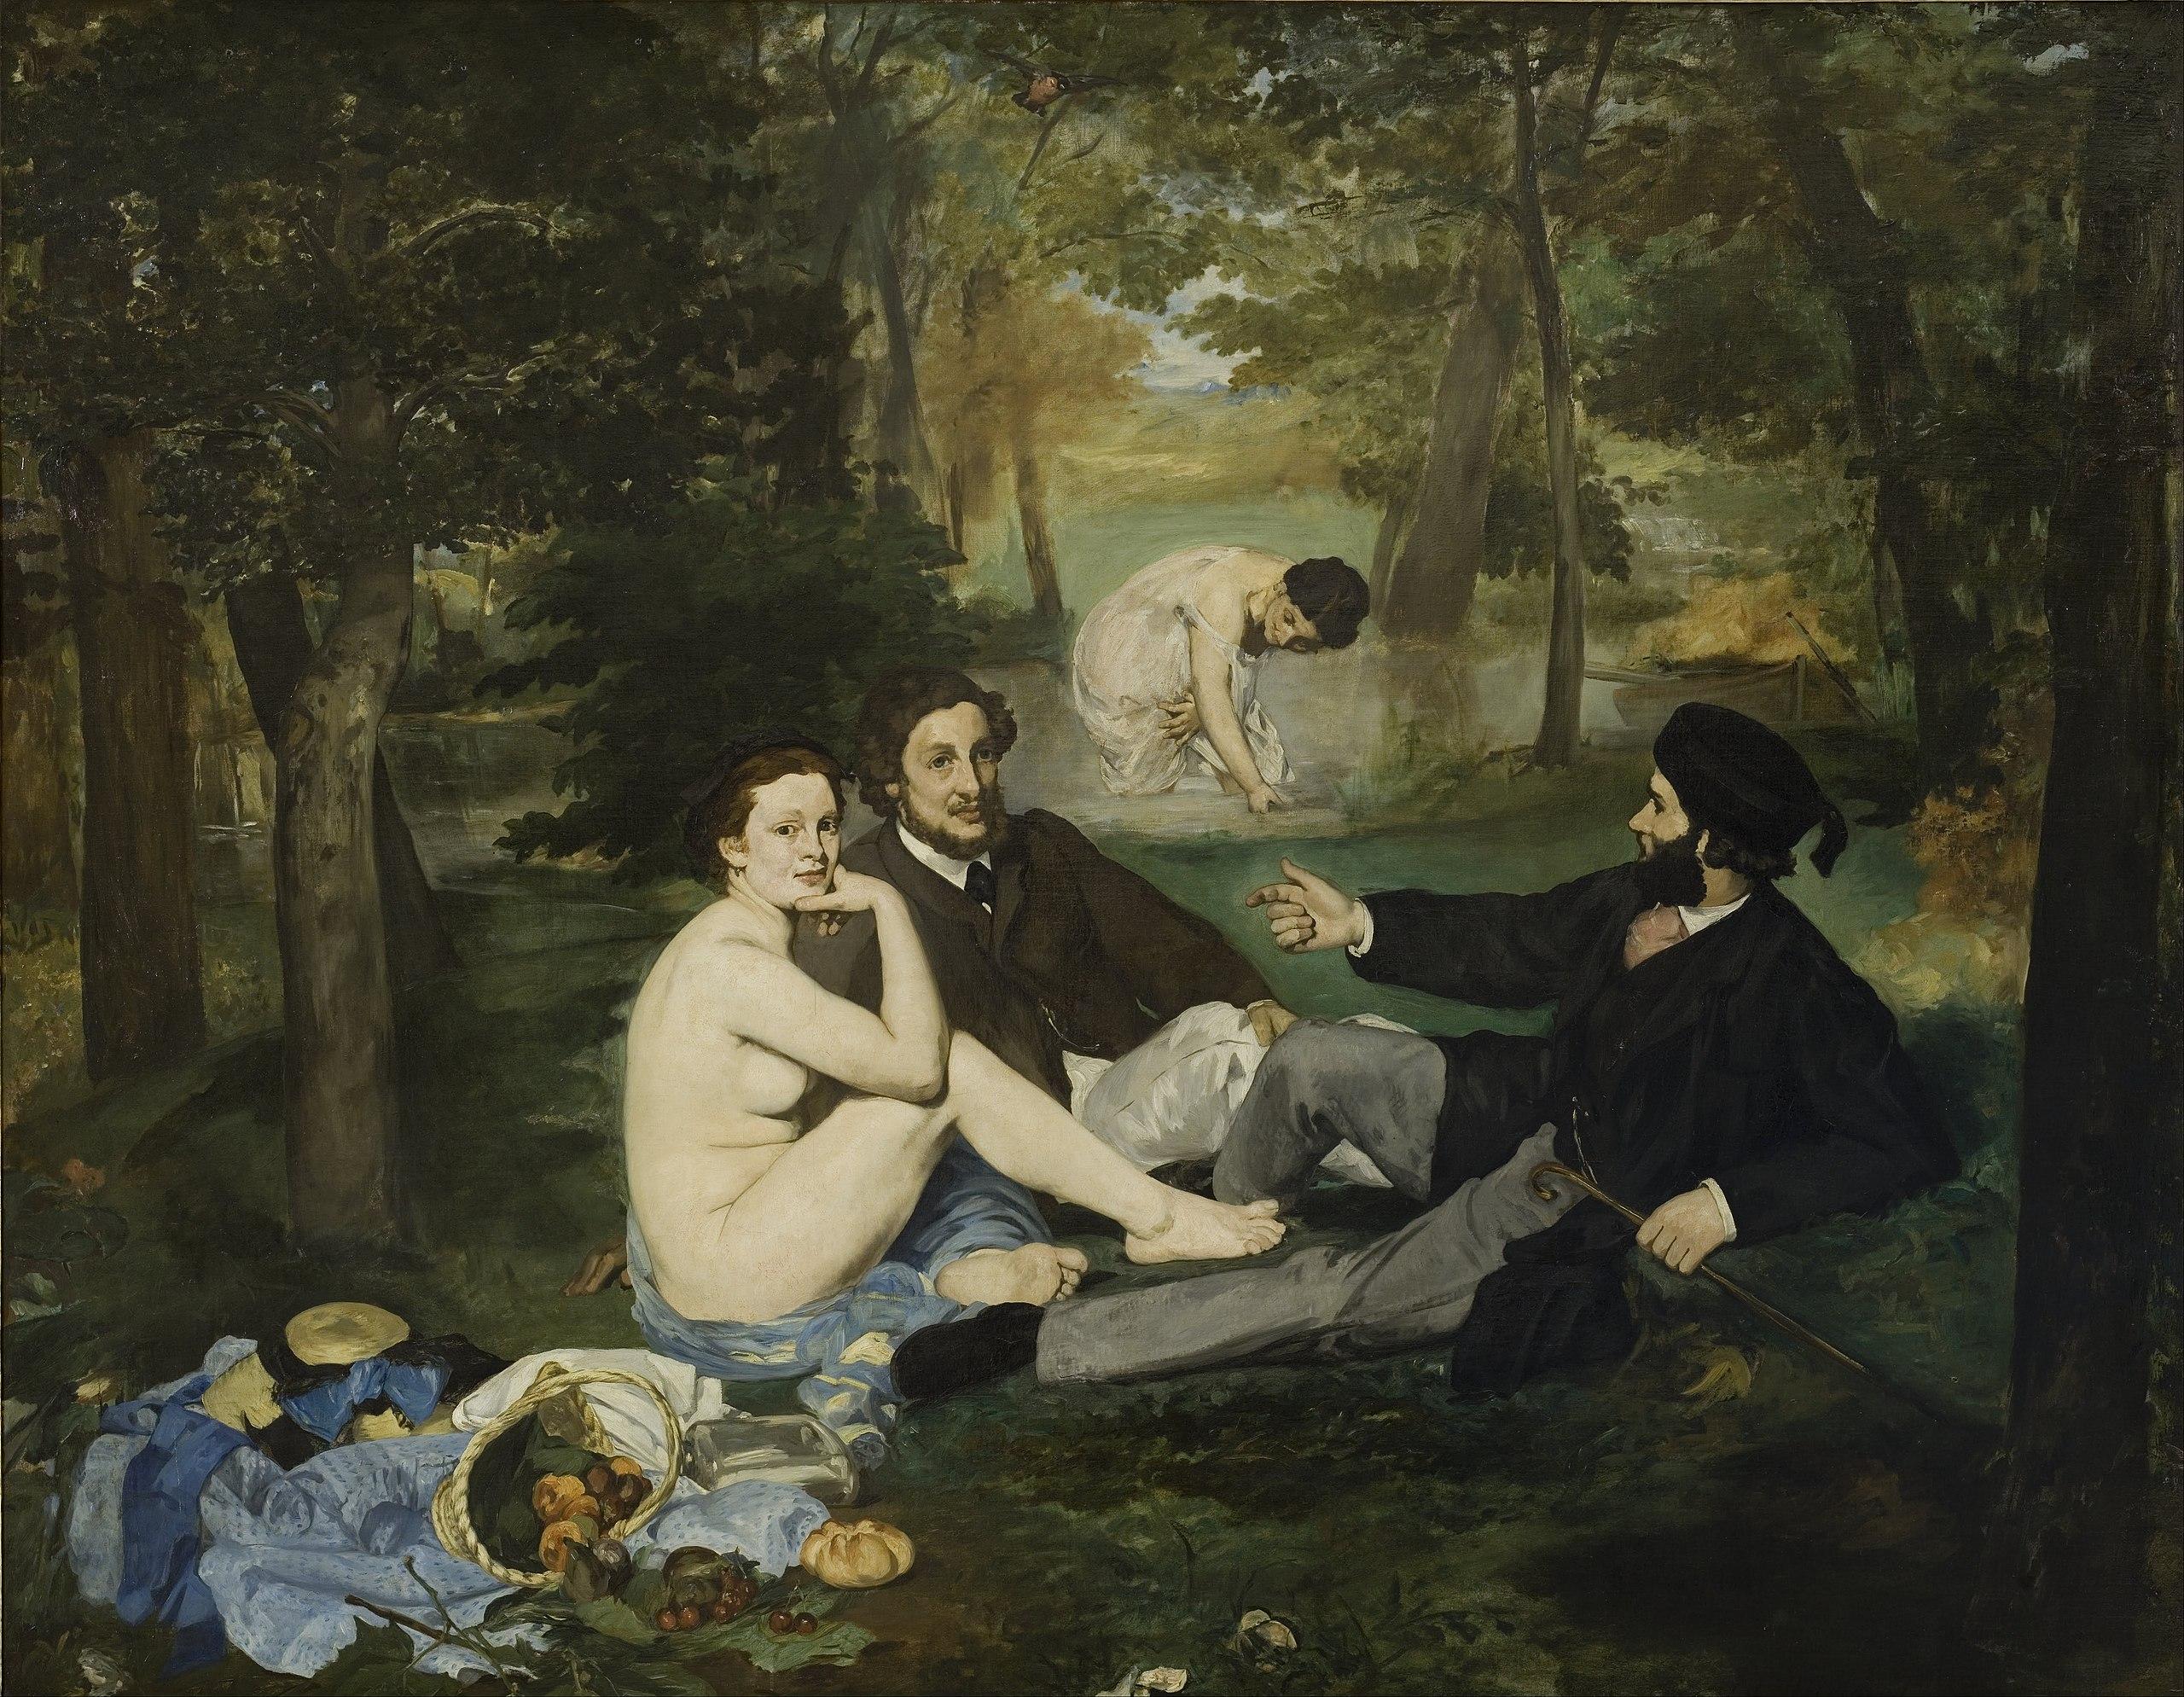 21. Colazione sull'erba - Édouard Manet (1863) - Musée d'Orsay, Parigi